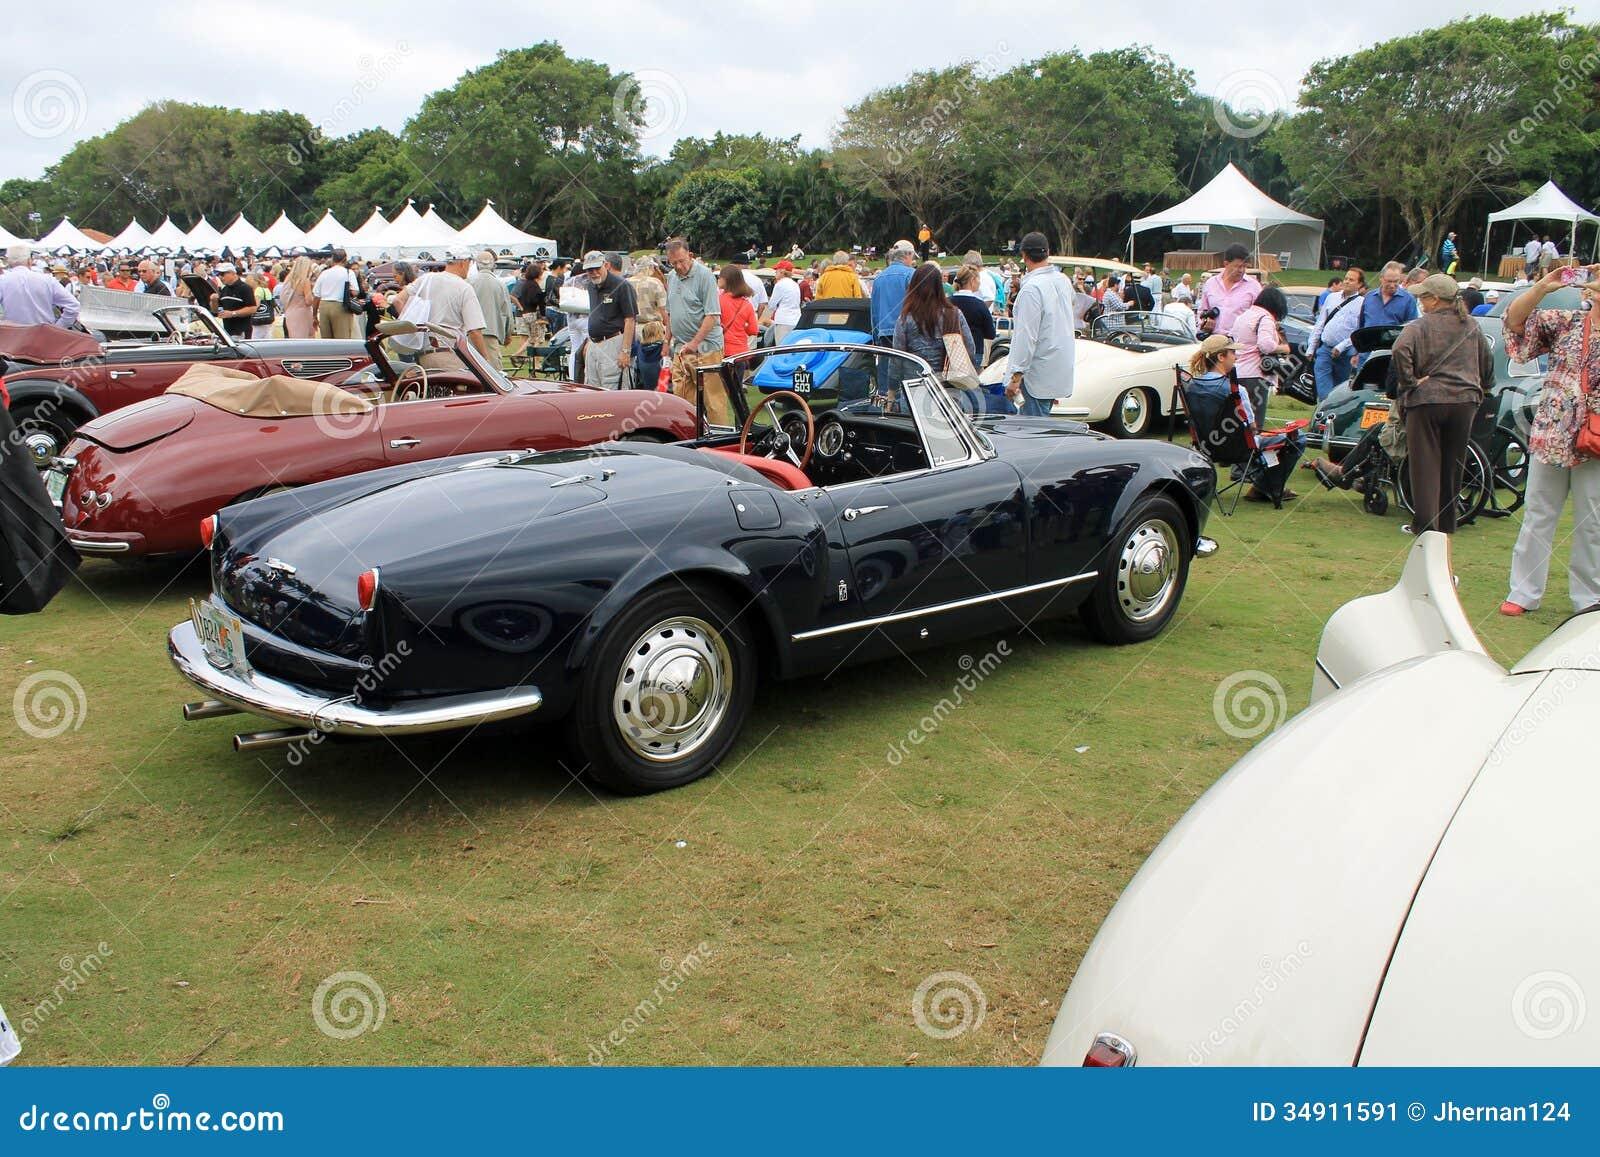 classic italian convertible sports car editorial photo image 34911591. Black Bedroom Furniture Sets. Home Design Ideas